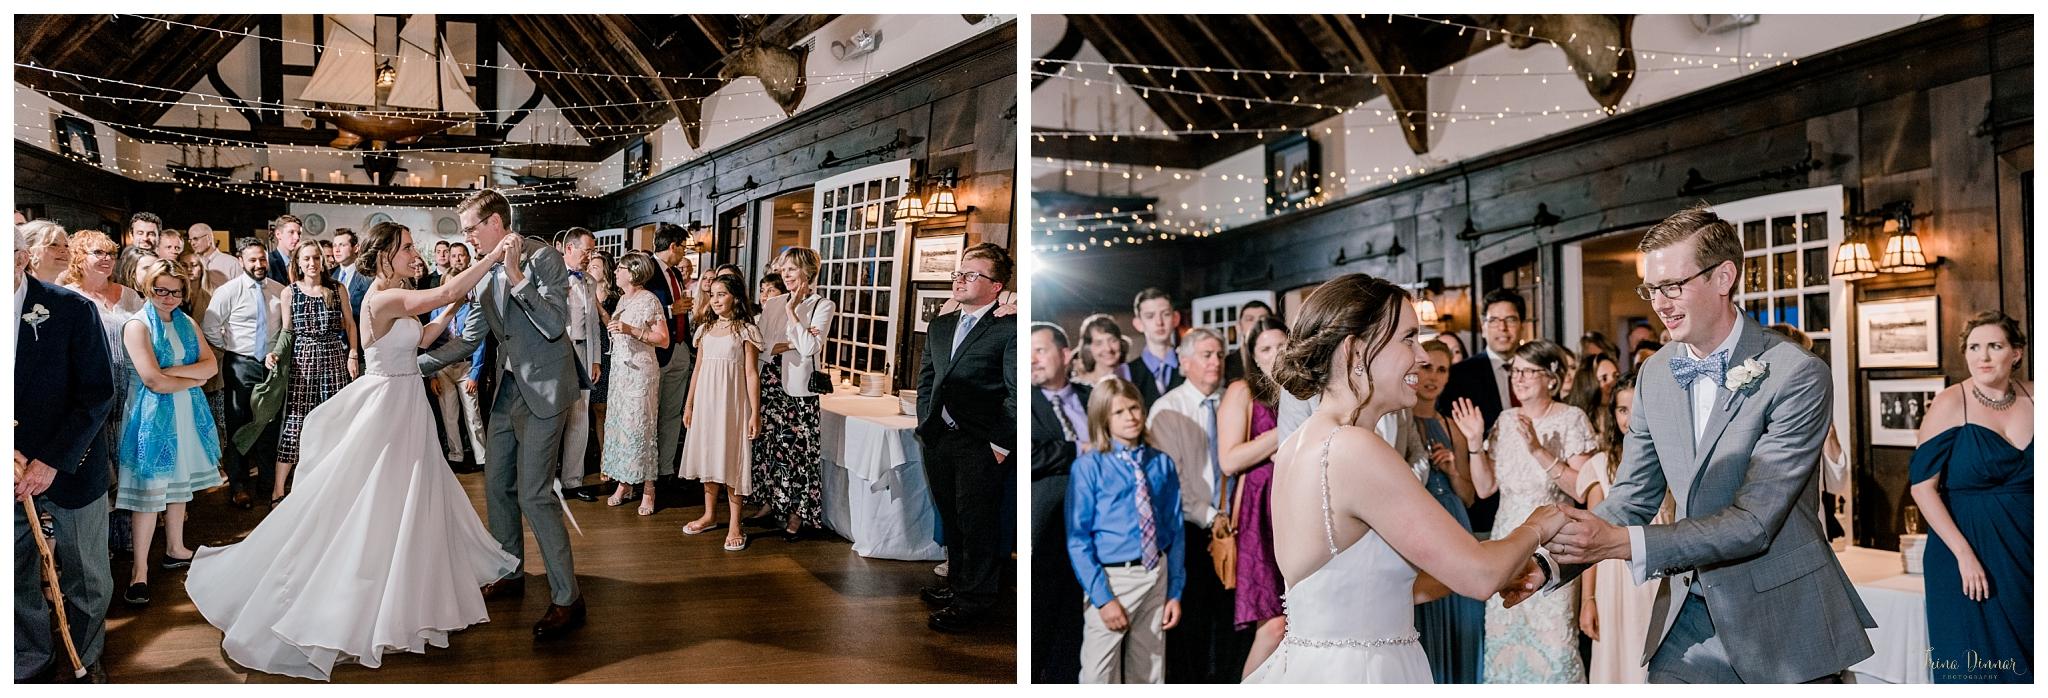 York Harbor Reading Room York Maine Wedding